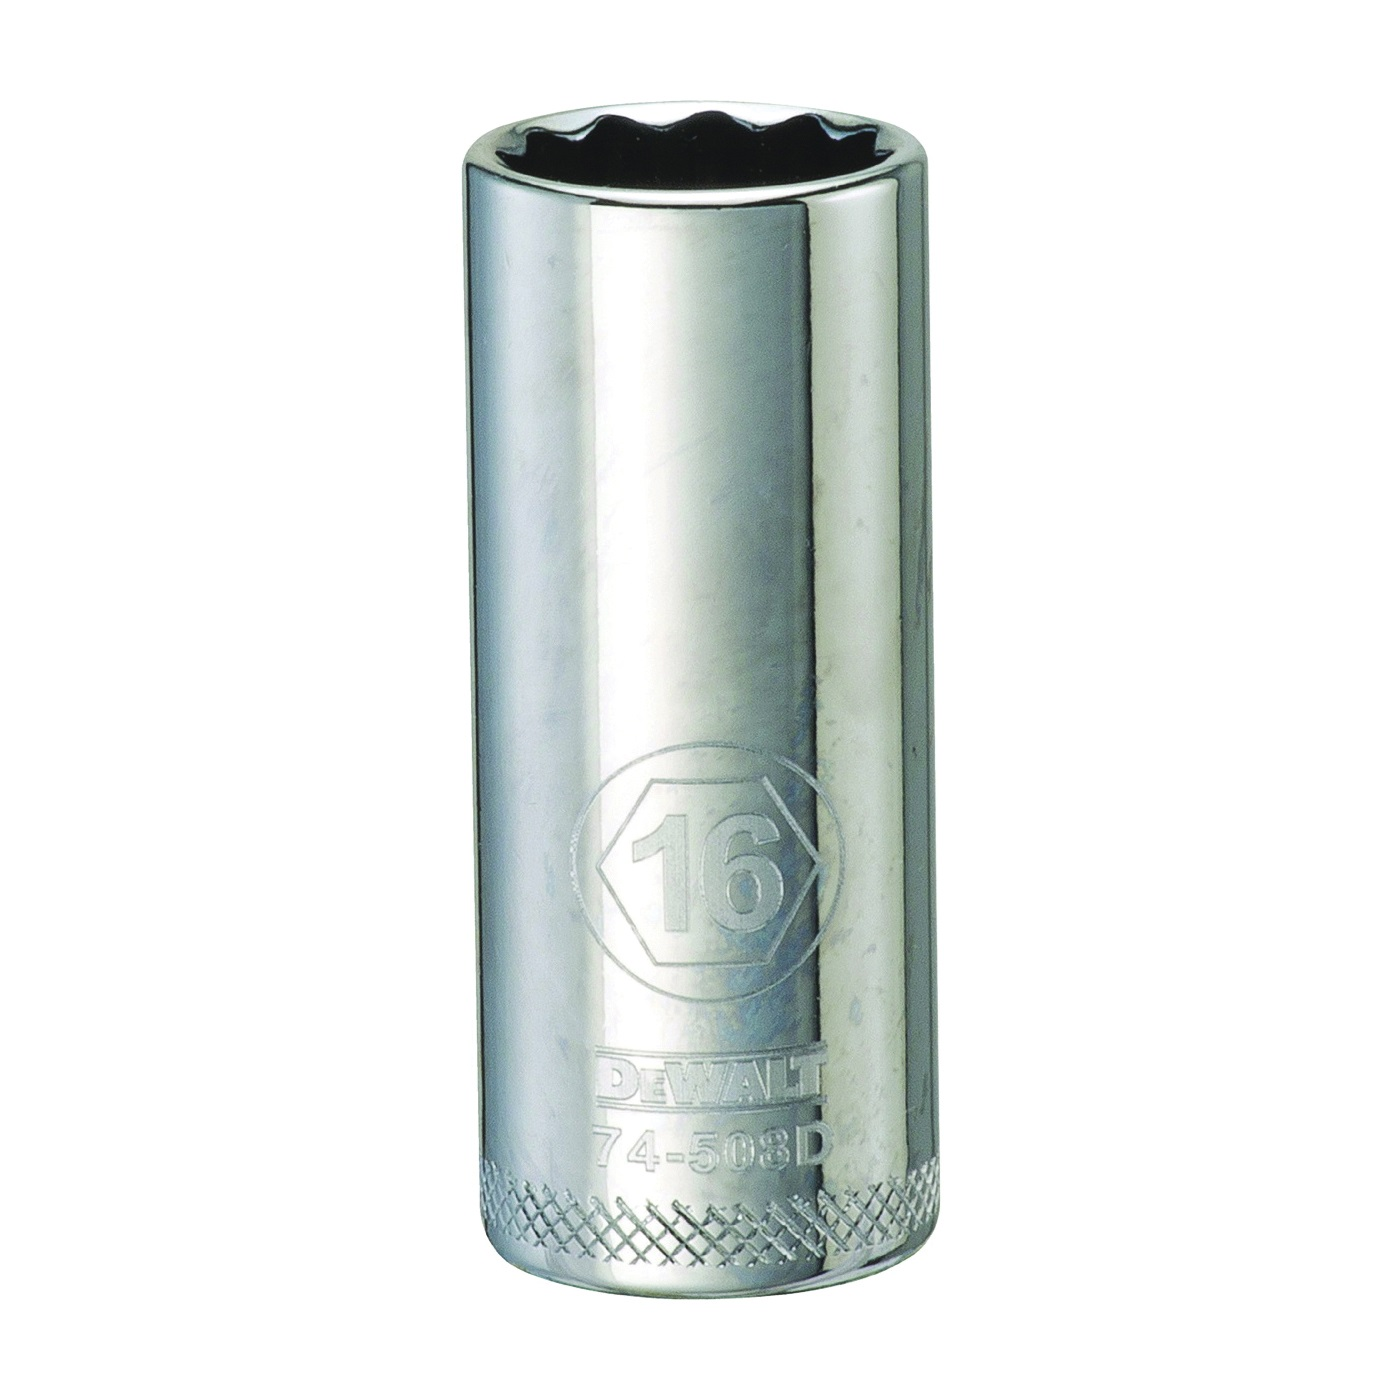 Picture of DeWALT DWMT74508OSP Drive Socket, 16 mm Socket, 3/8 in Drive, 12 -Point, Vanadium Steel, Polished Chrome